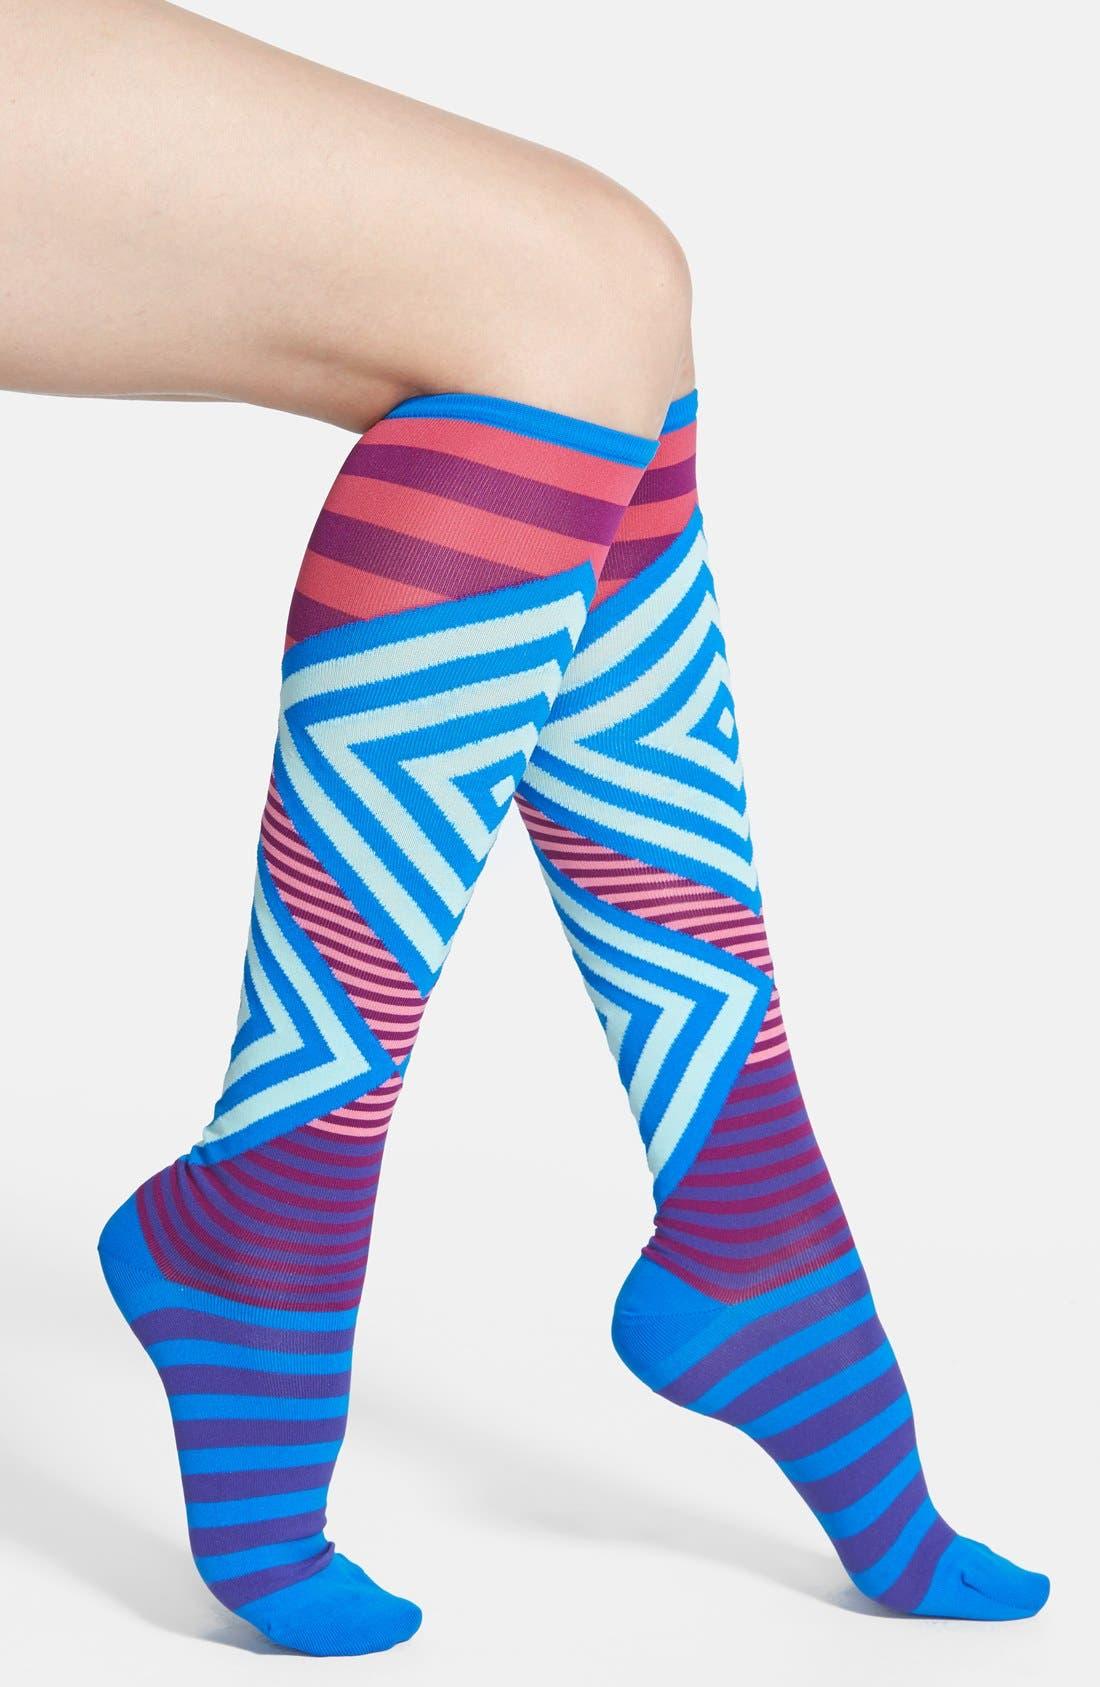 Main Image - Hot Sox Mixed Stripe Knee High Socks